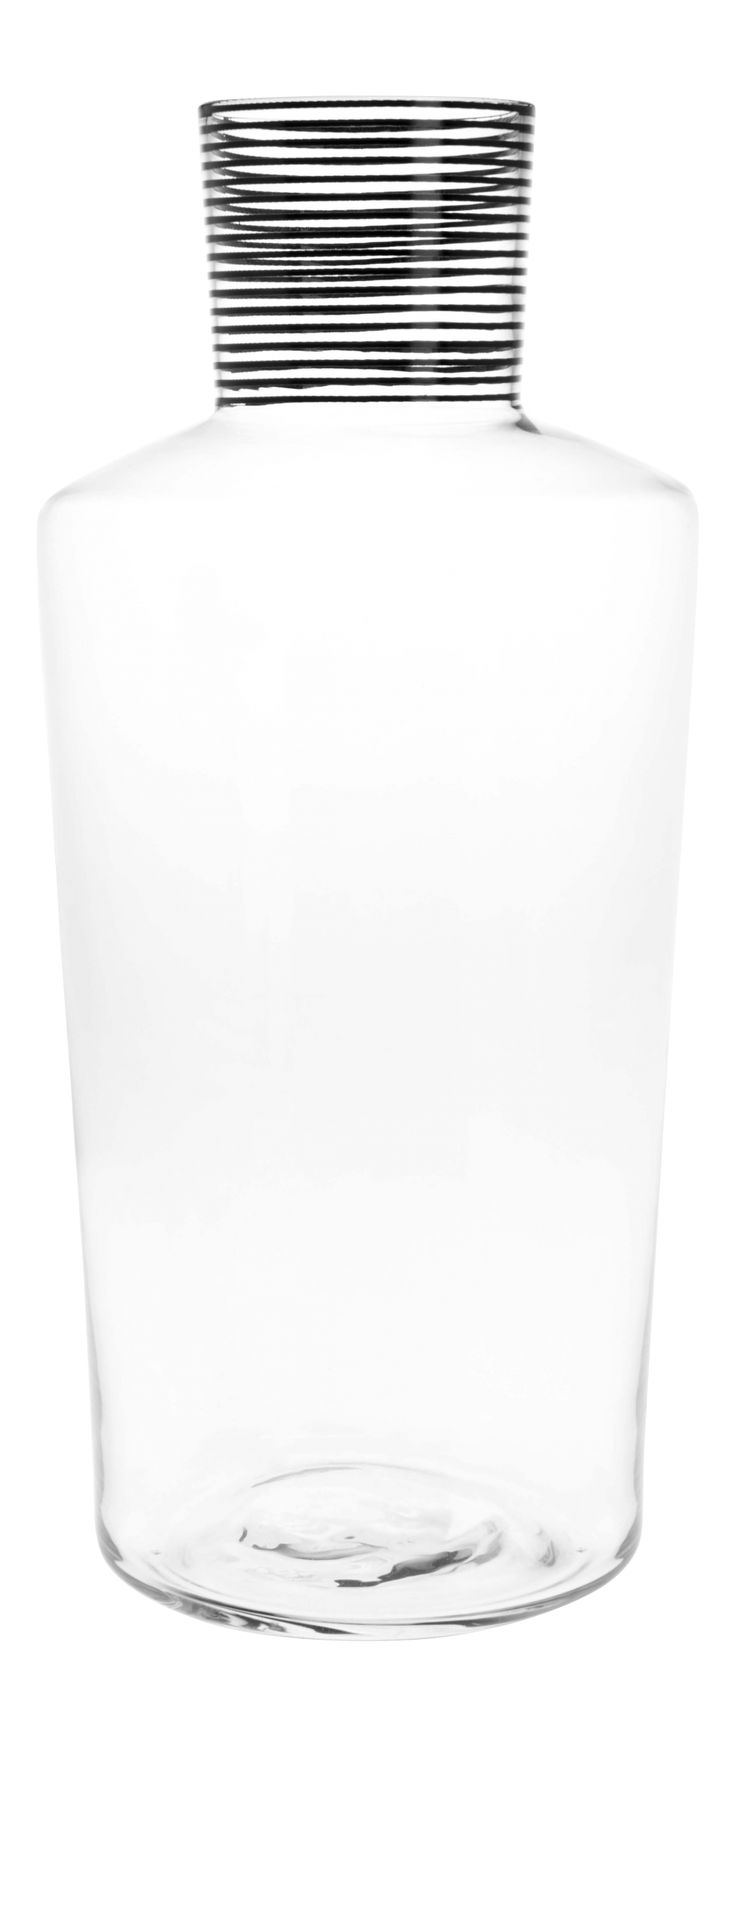 DANDY DANDY/ GLASS CARAFE WITH BLACK